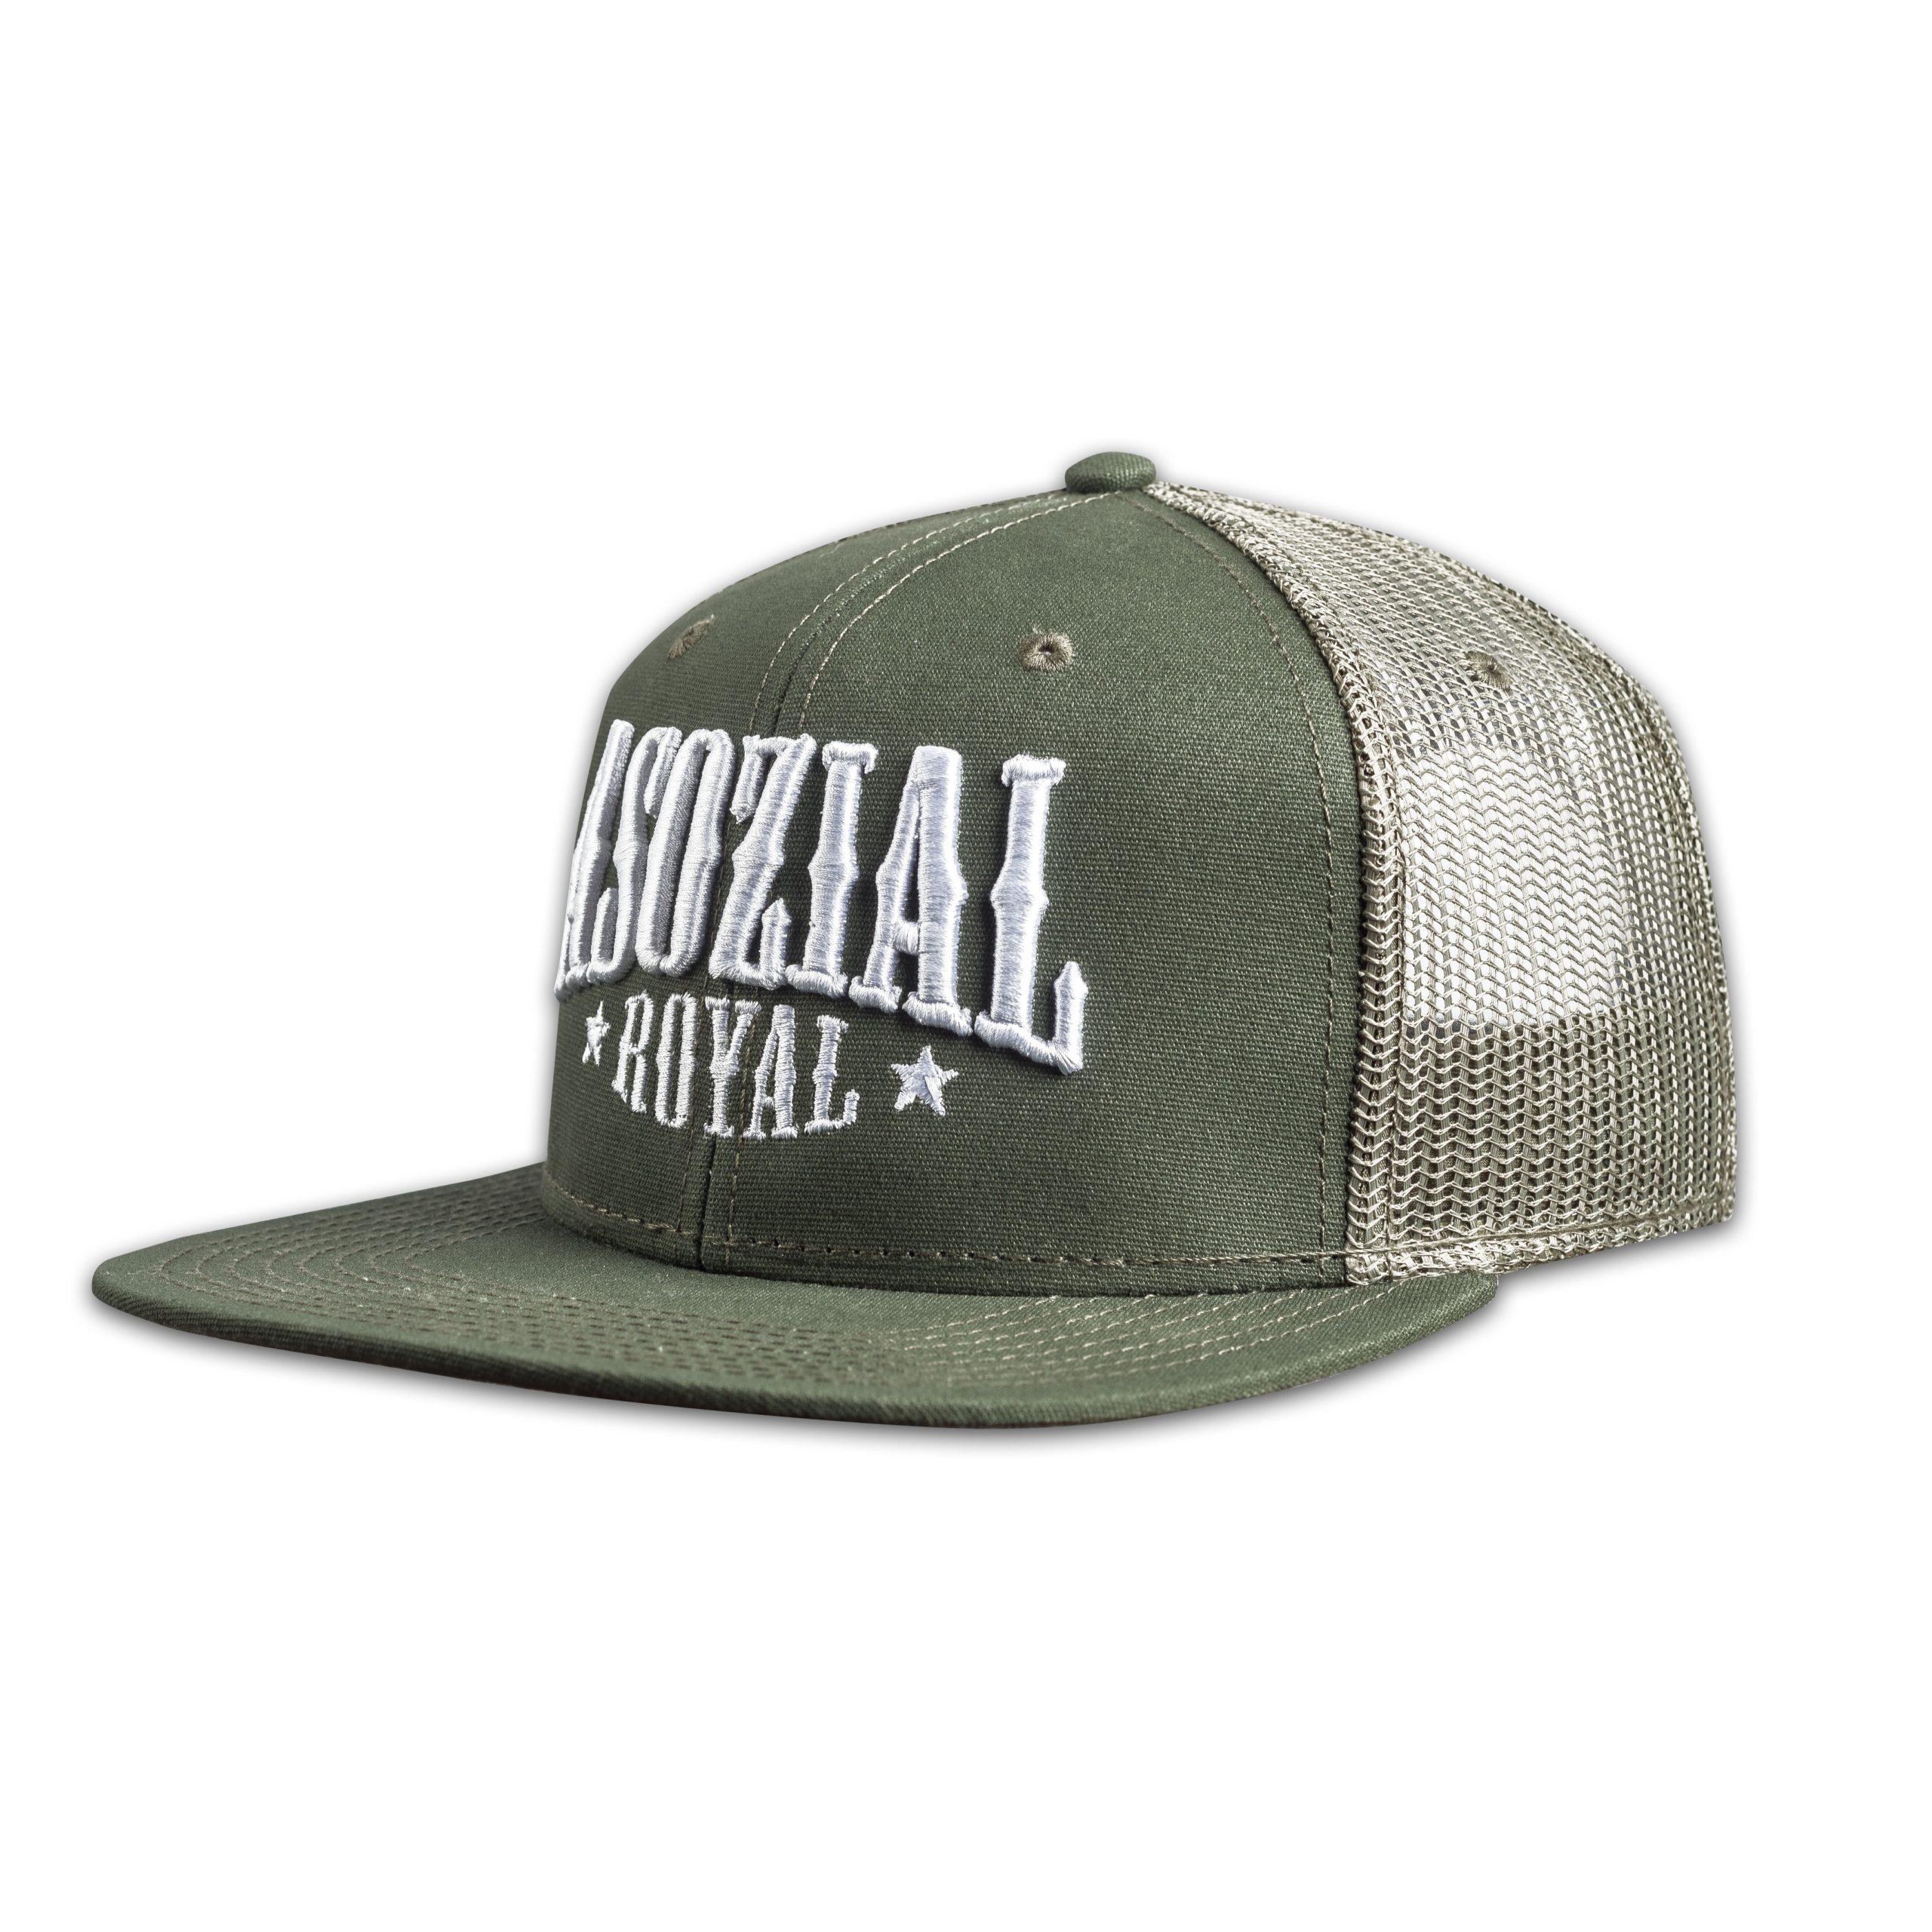 Trucker-Snapback Mesh Asozial Royal Khaki